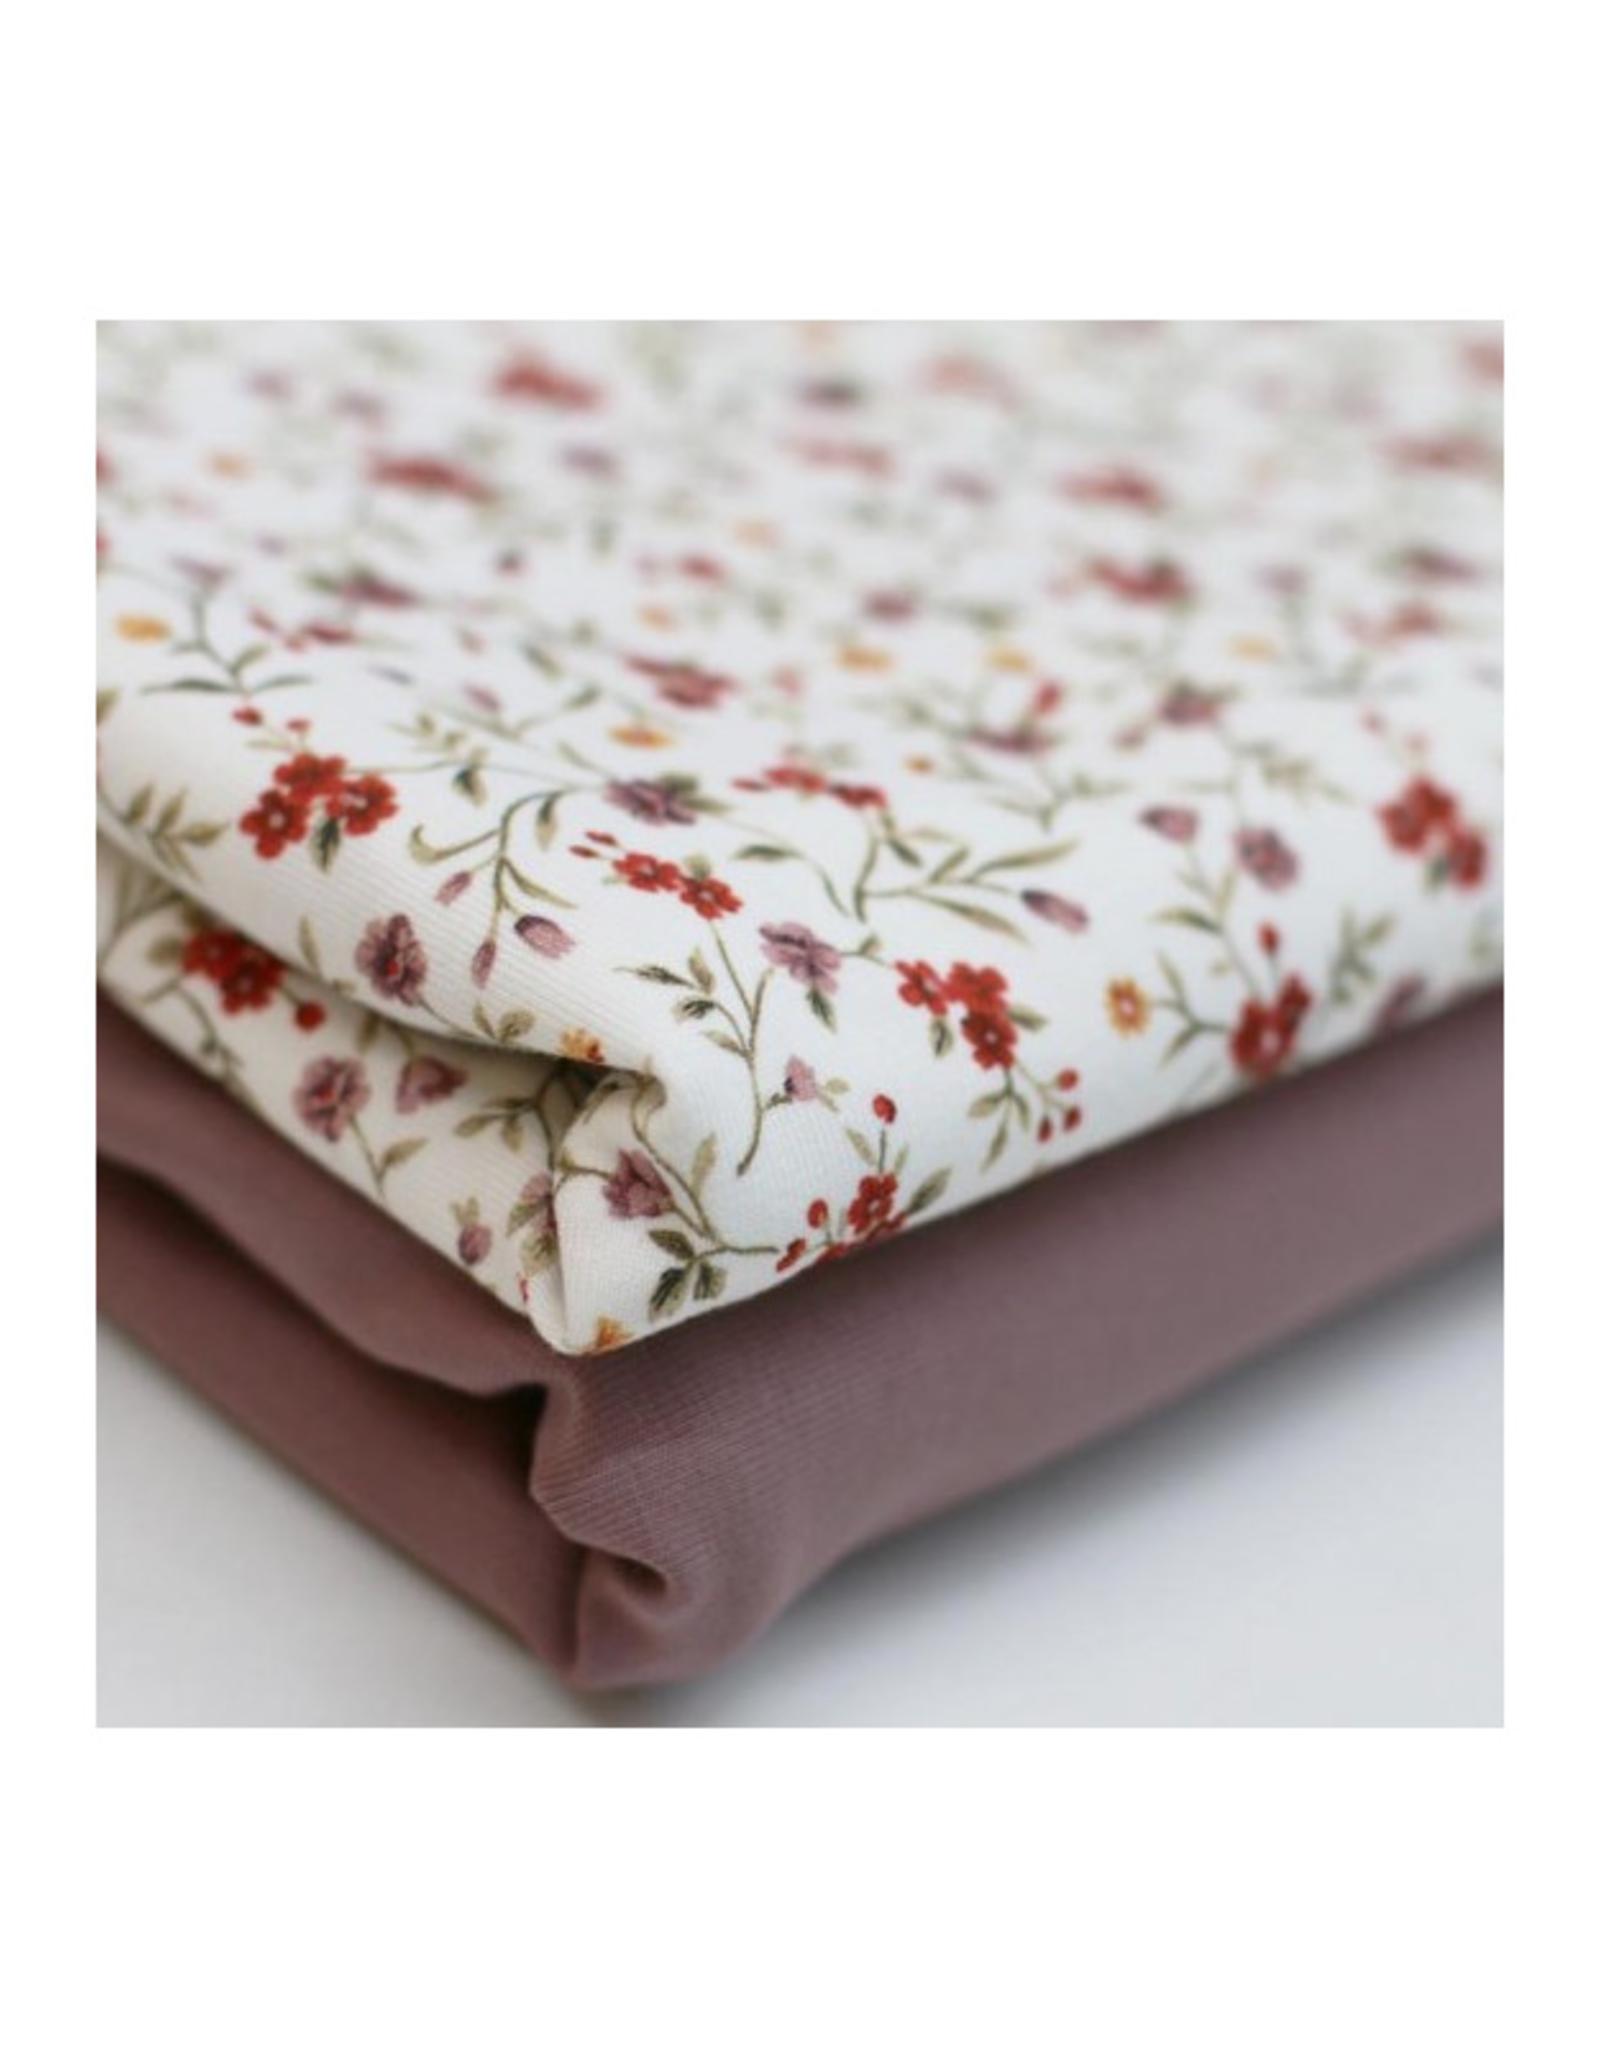 Jersey Digital Print - Romantic Flower roest